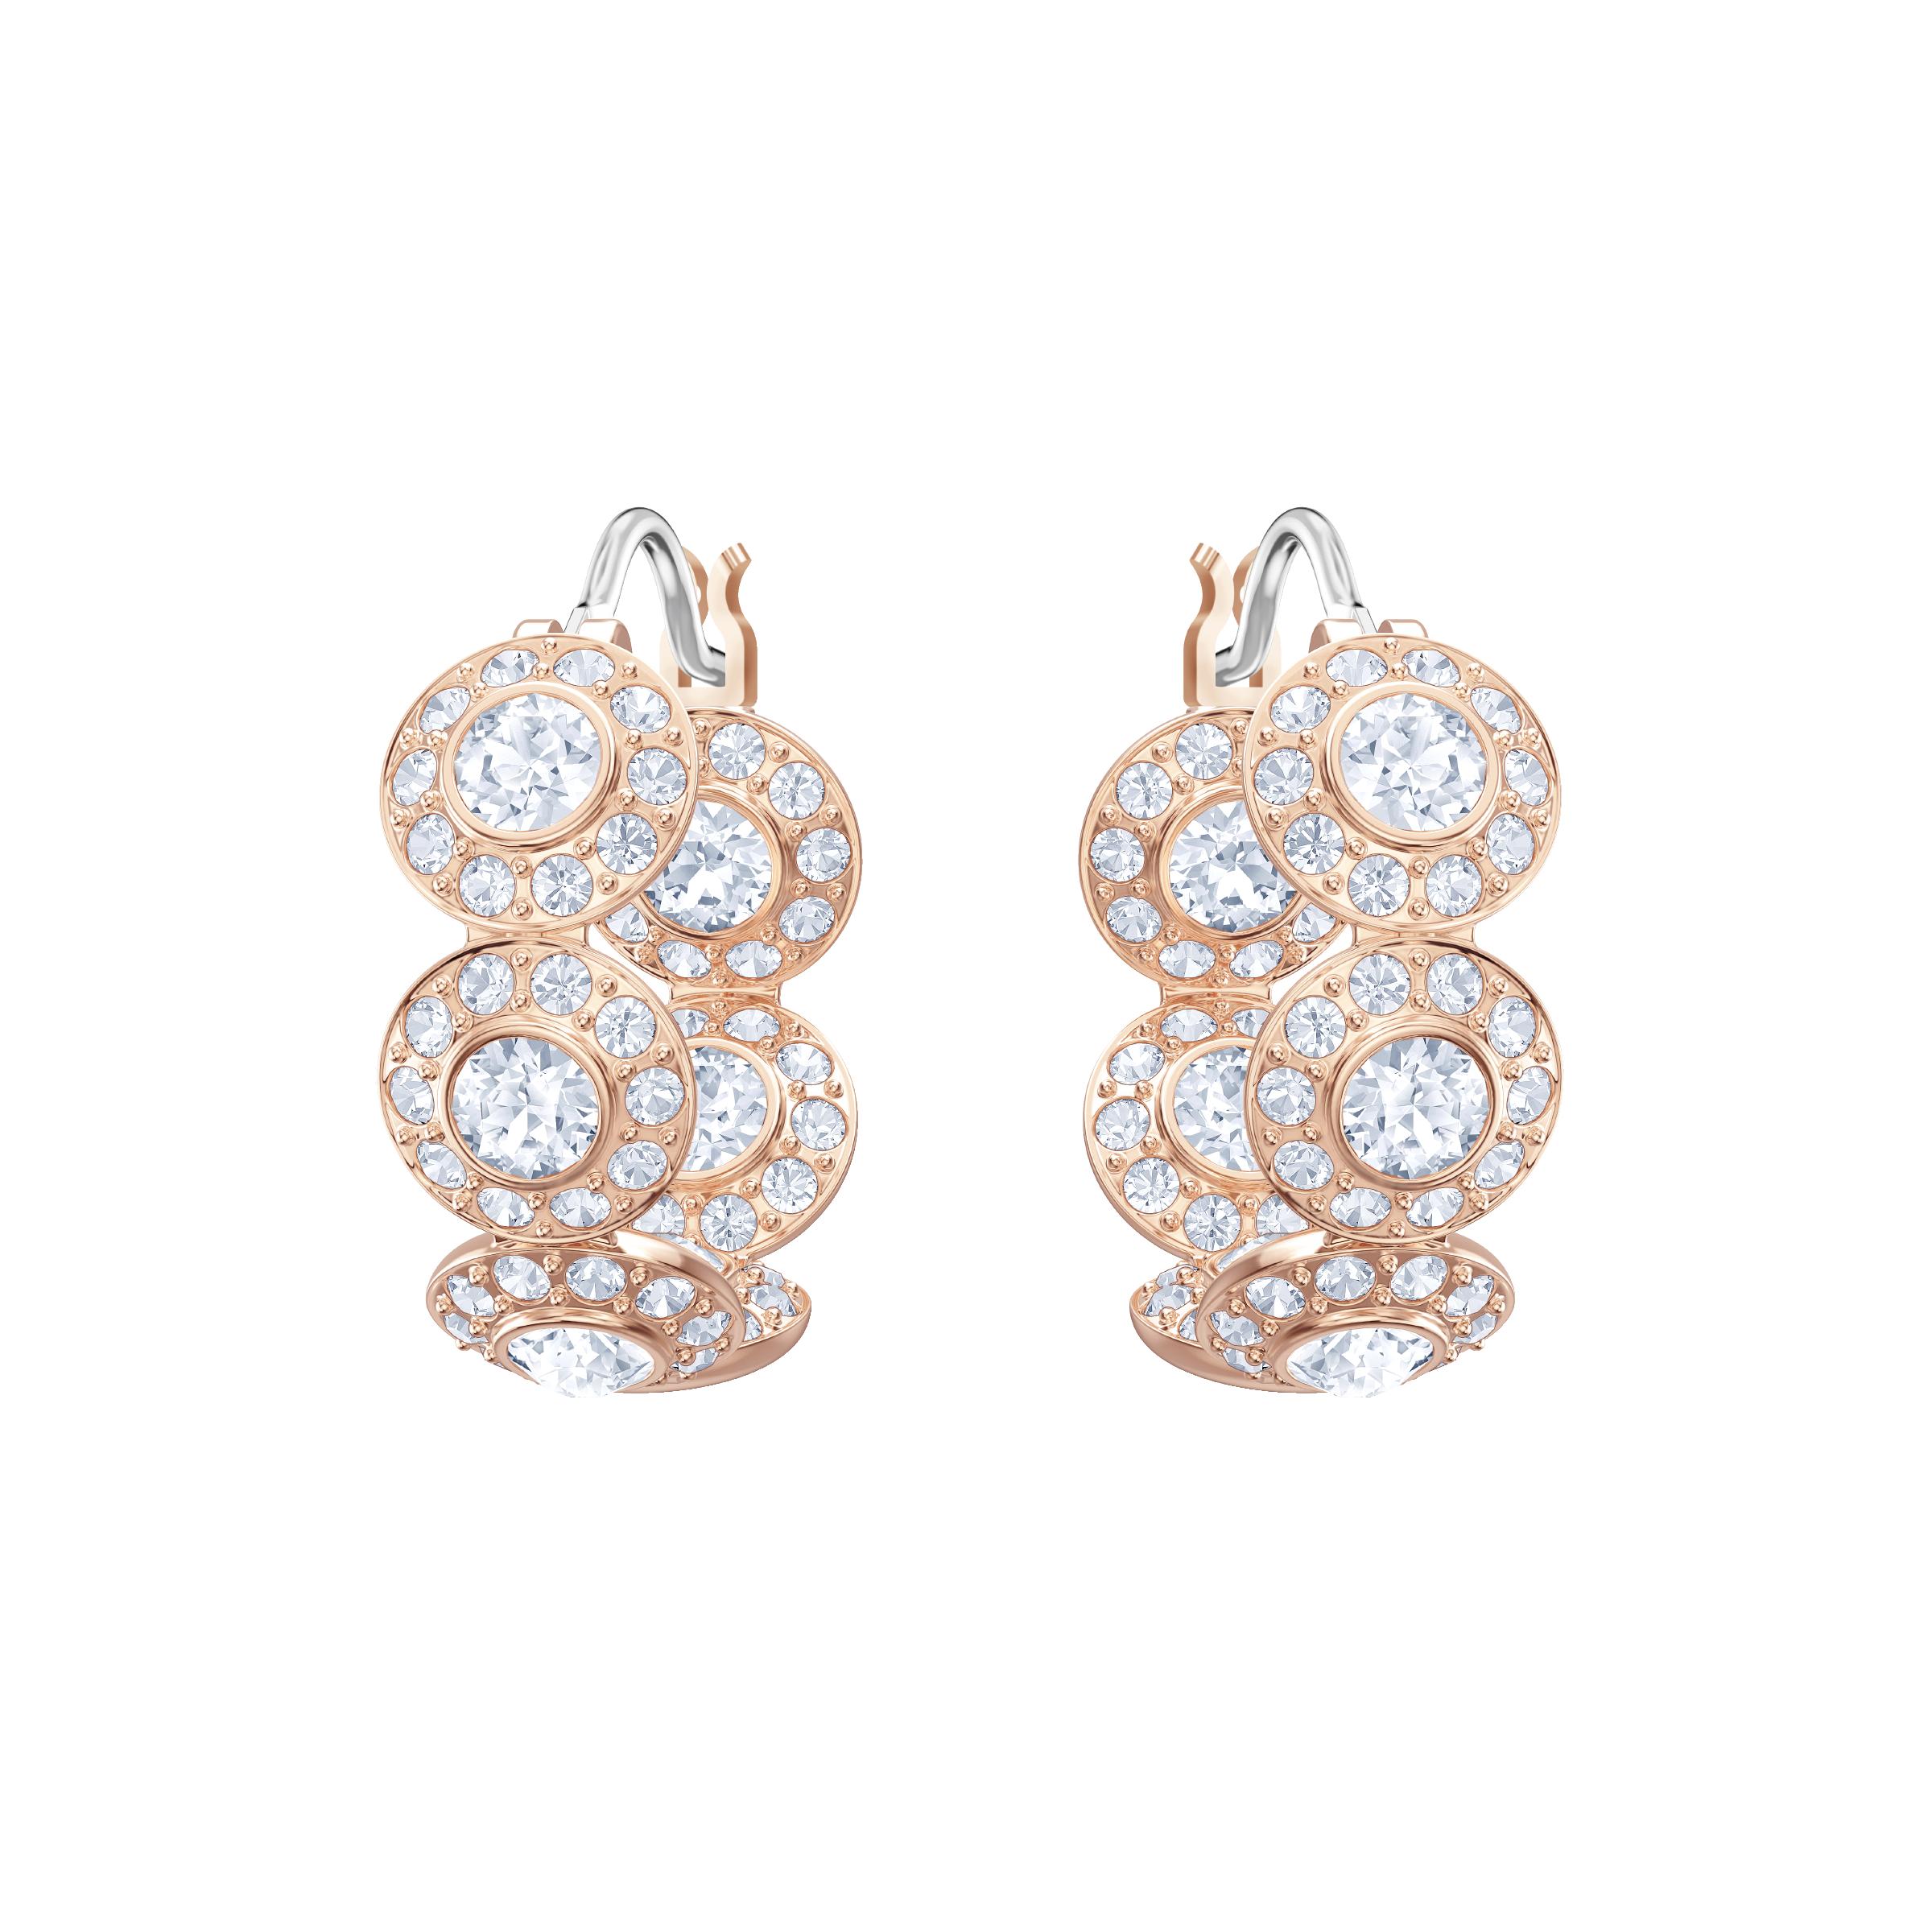 Angelic Hoop Pierced Earrings, White, Rose Gold Plating